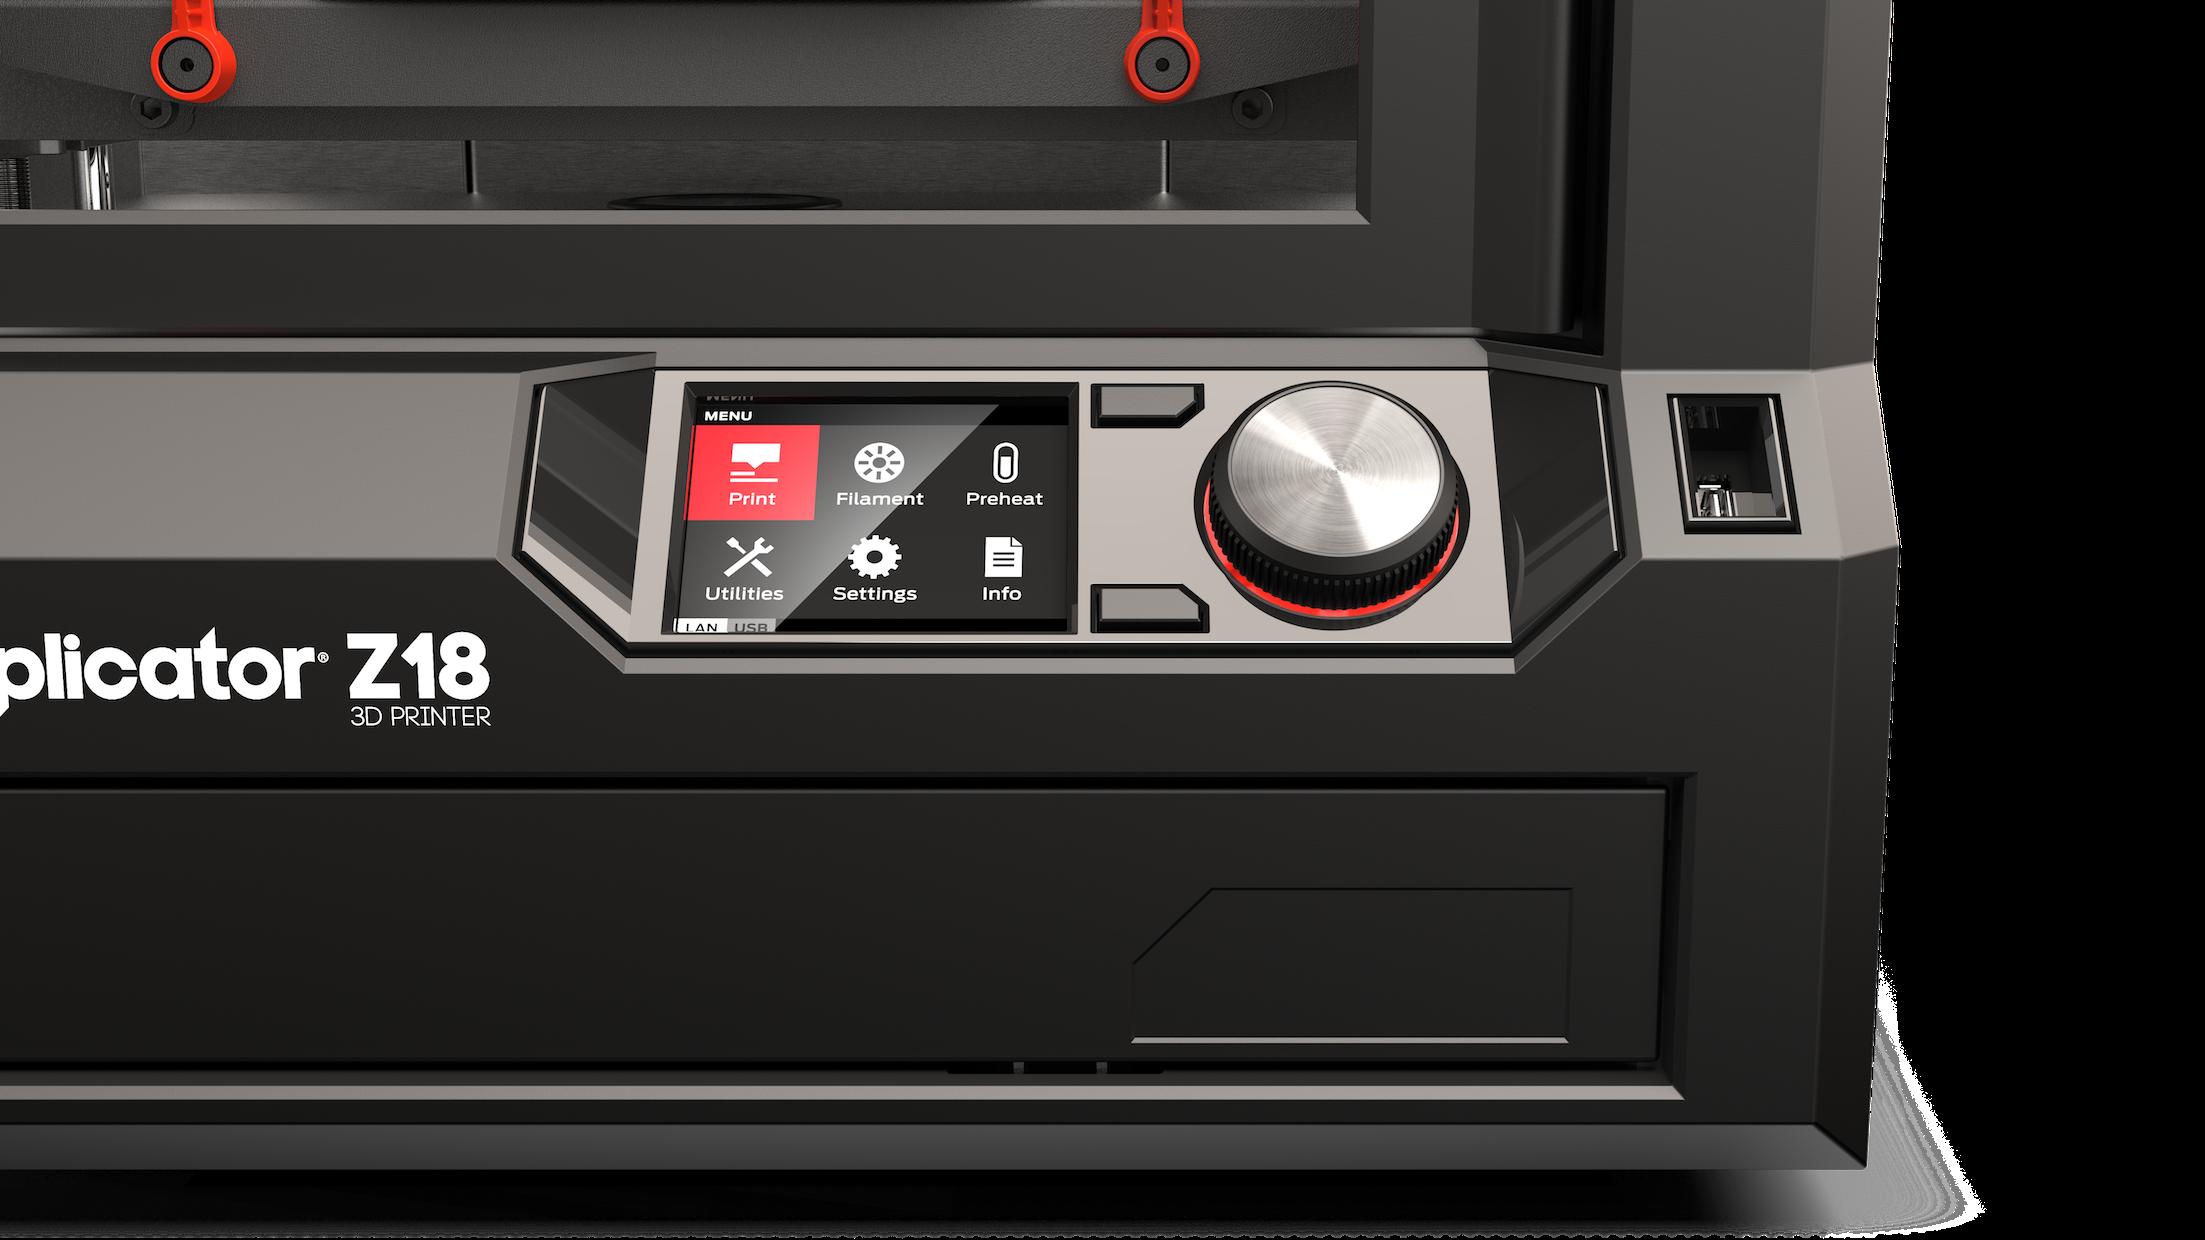 Makerbot replicator z18 wireless 3d printer by office depot makerbot replicator z18 wireless 3d printer by office depot officemax fandeluxe Choice Image